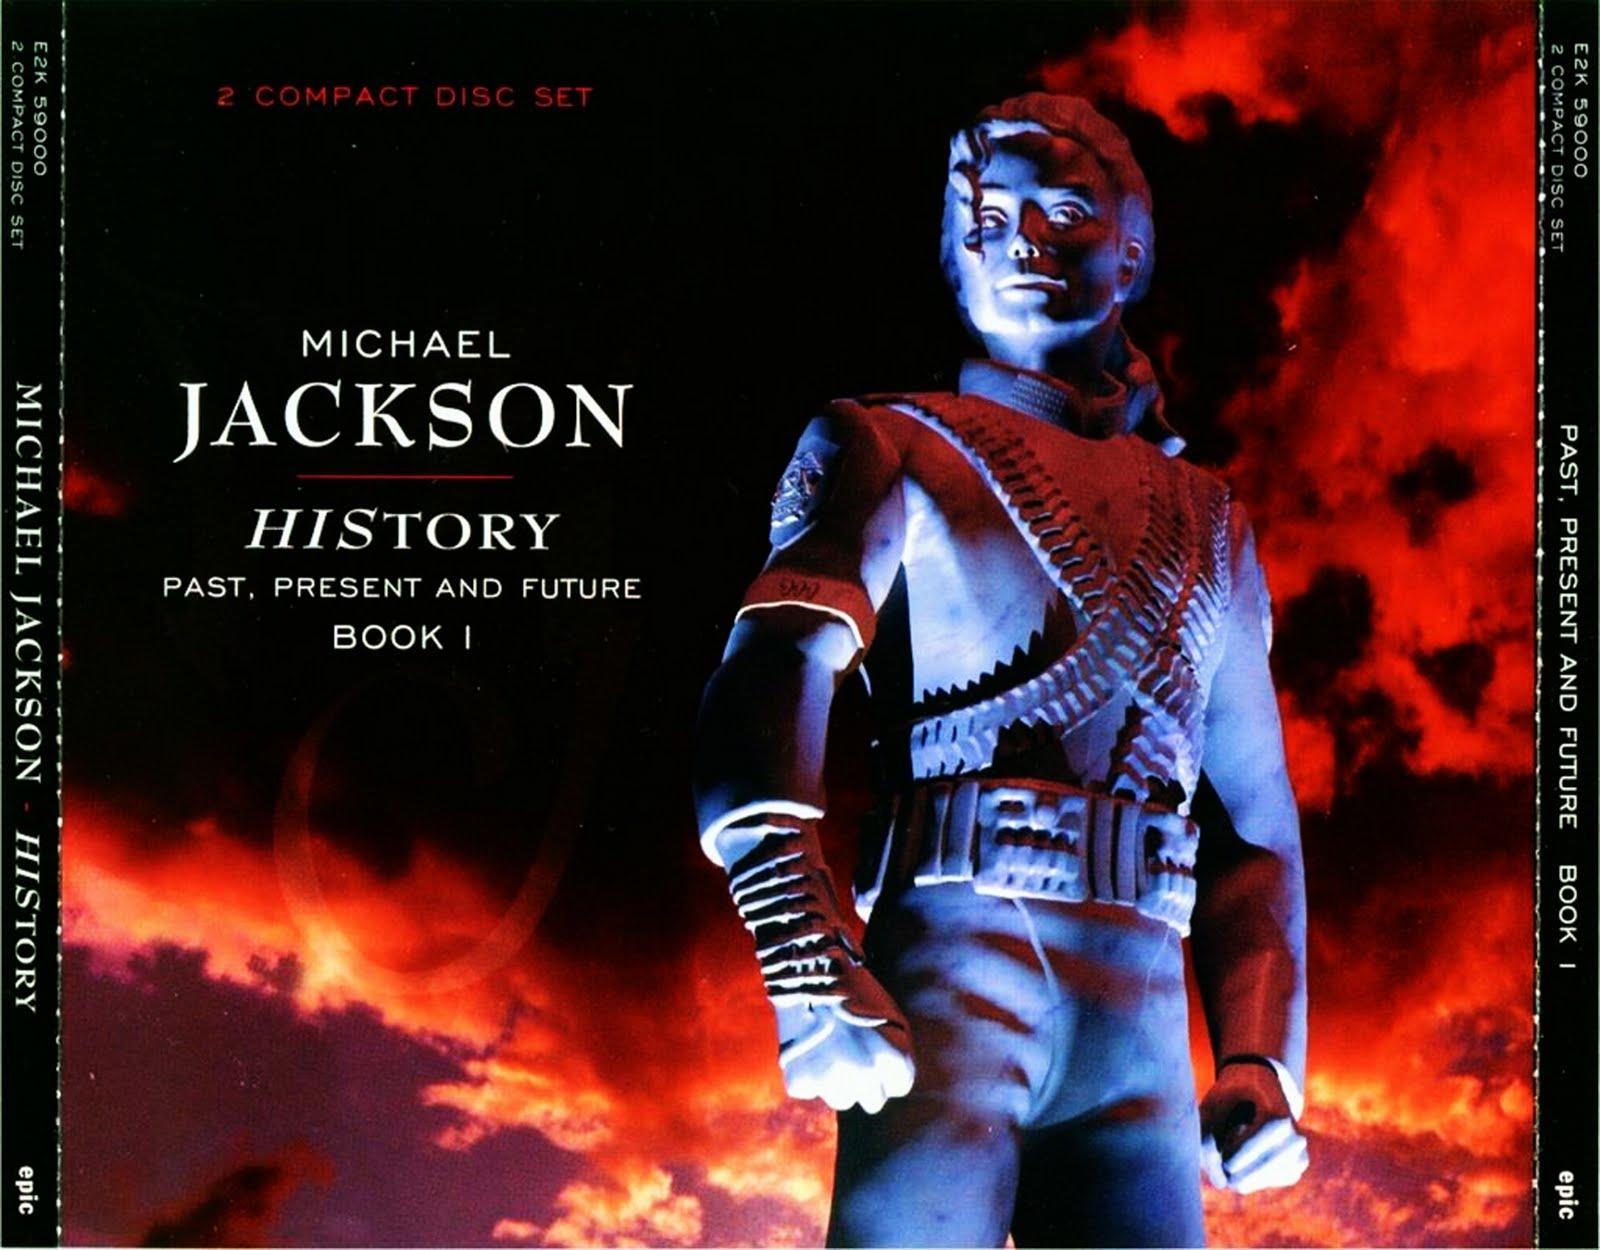 http://1.bp.blogspot.com/_f2iAGRf_Ioo/TJEs5UKE-pI/AAAAAAAABl4/-iX-vEgj4Xc/s1600/000.+Michael+Jackson+-+History,+Book+I+-+Front.jpg